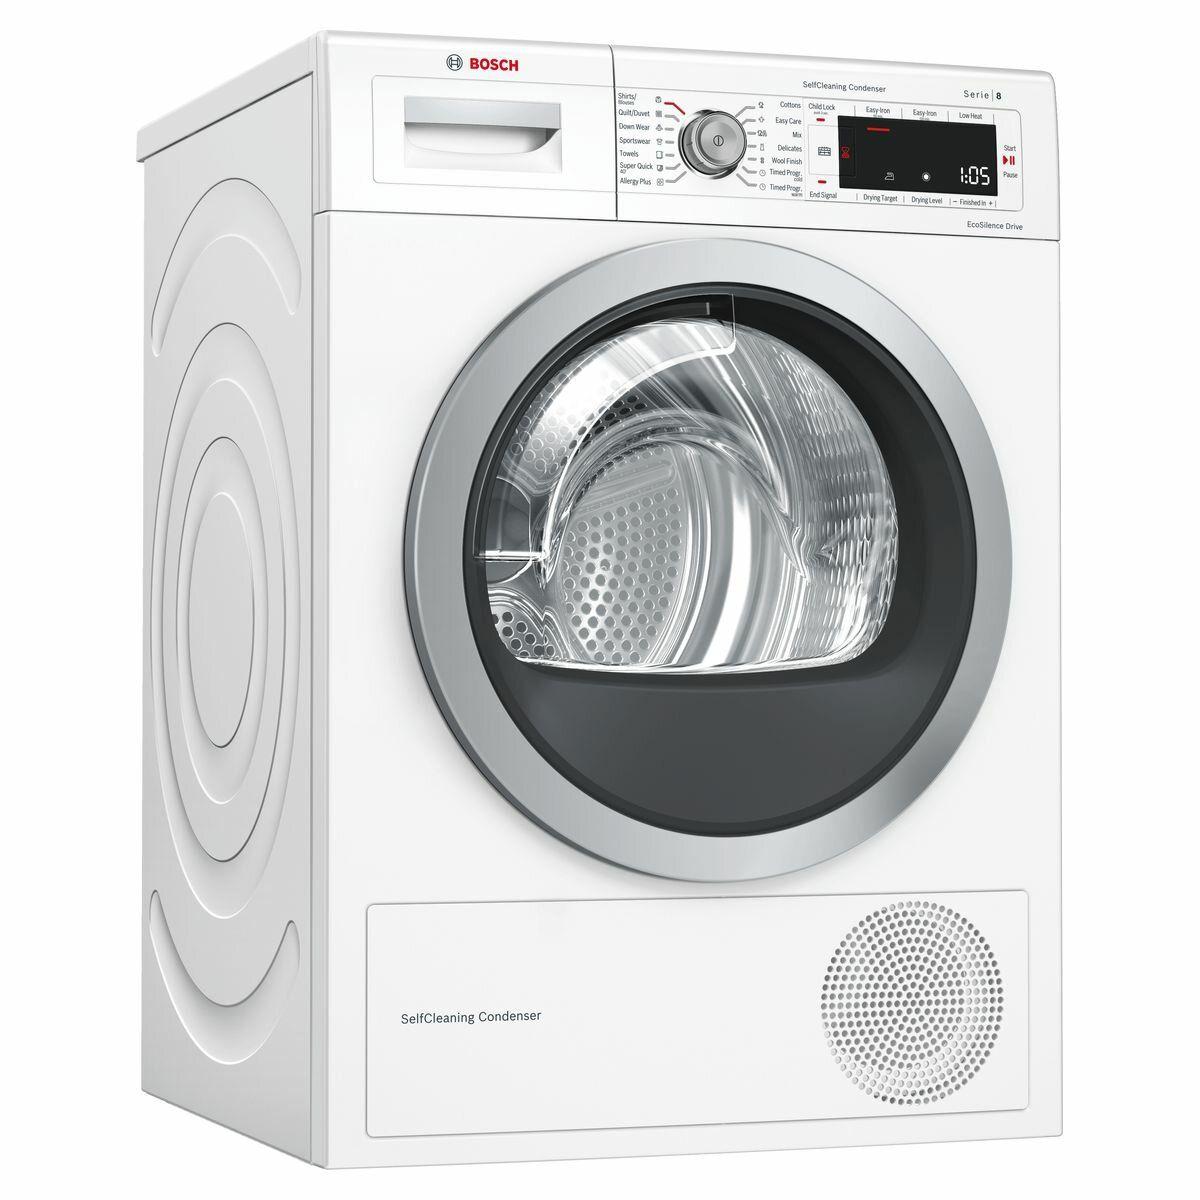 Bosch 9kg Serie 8 Heat Pump Dryer WTW87566AU | Winning Appliances | Bếp, Máy  rửa chén, Máy giặt